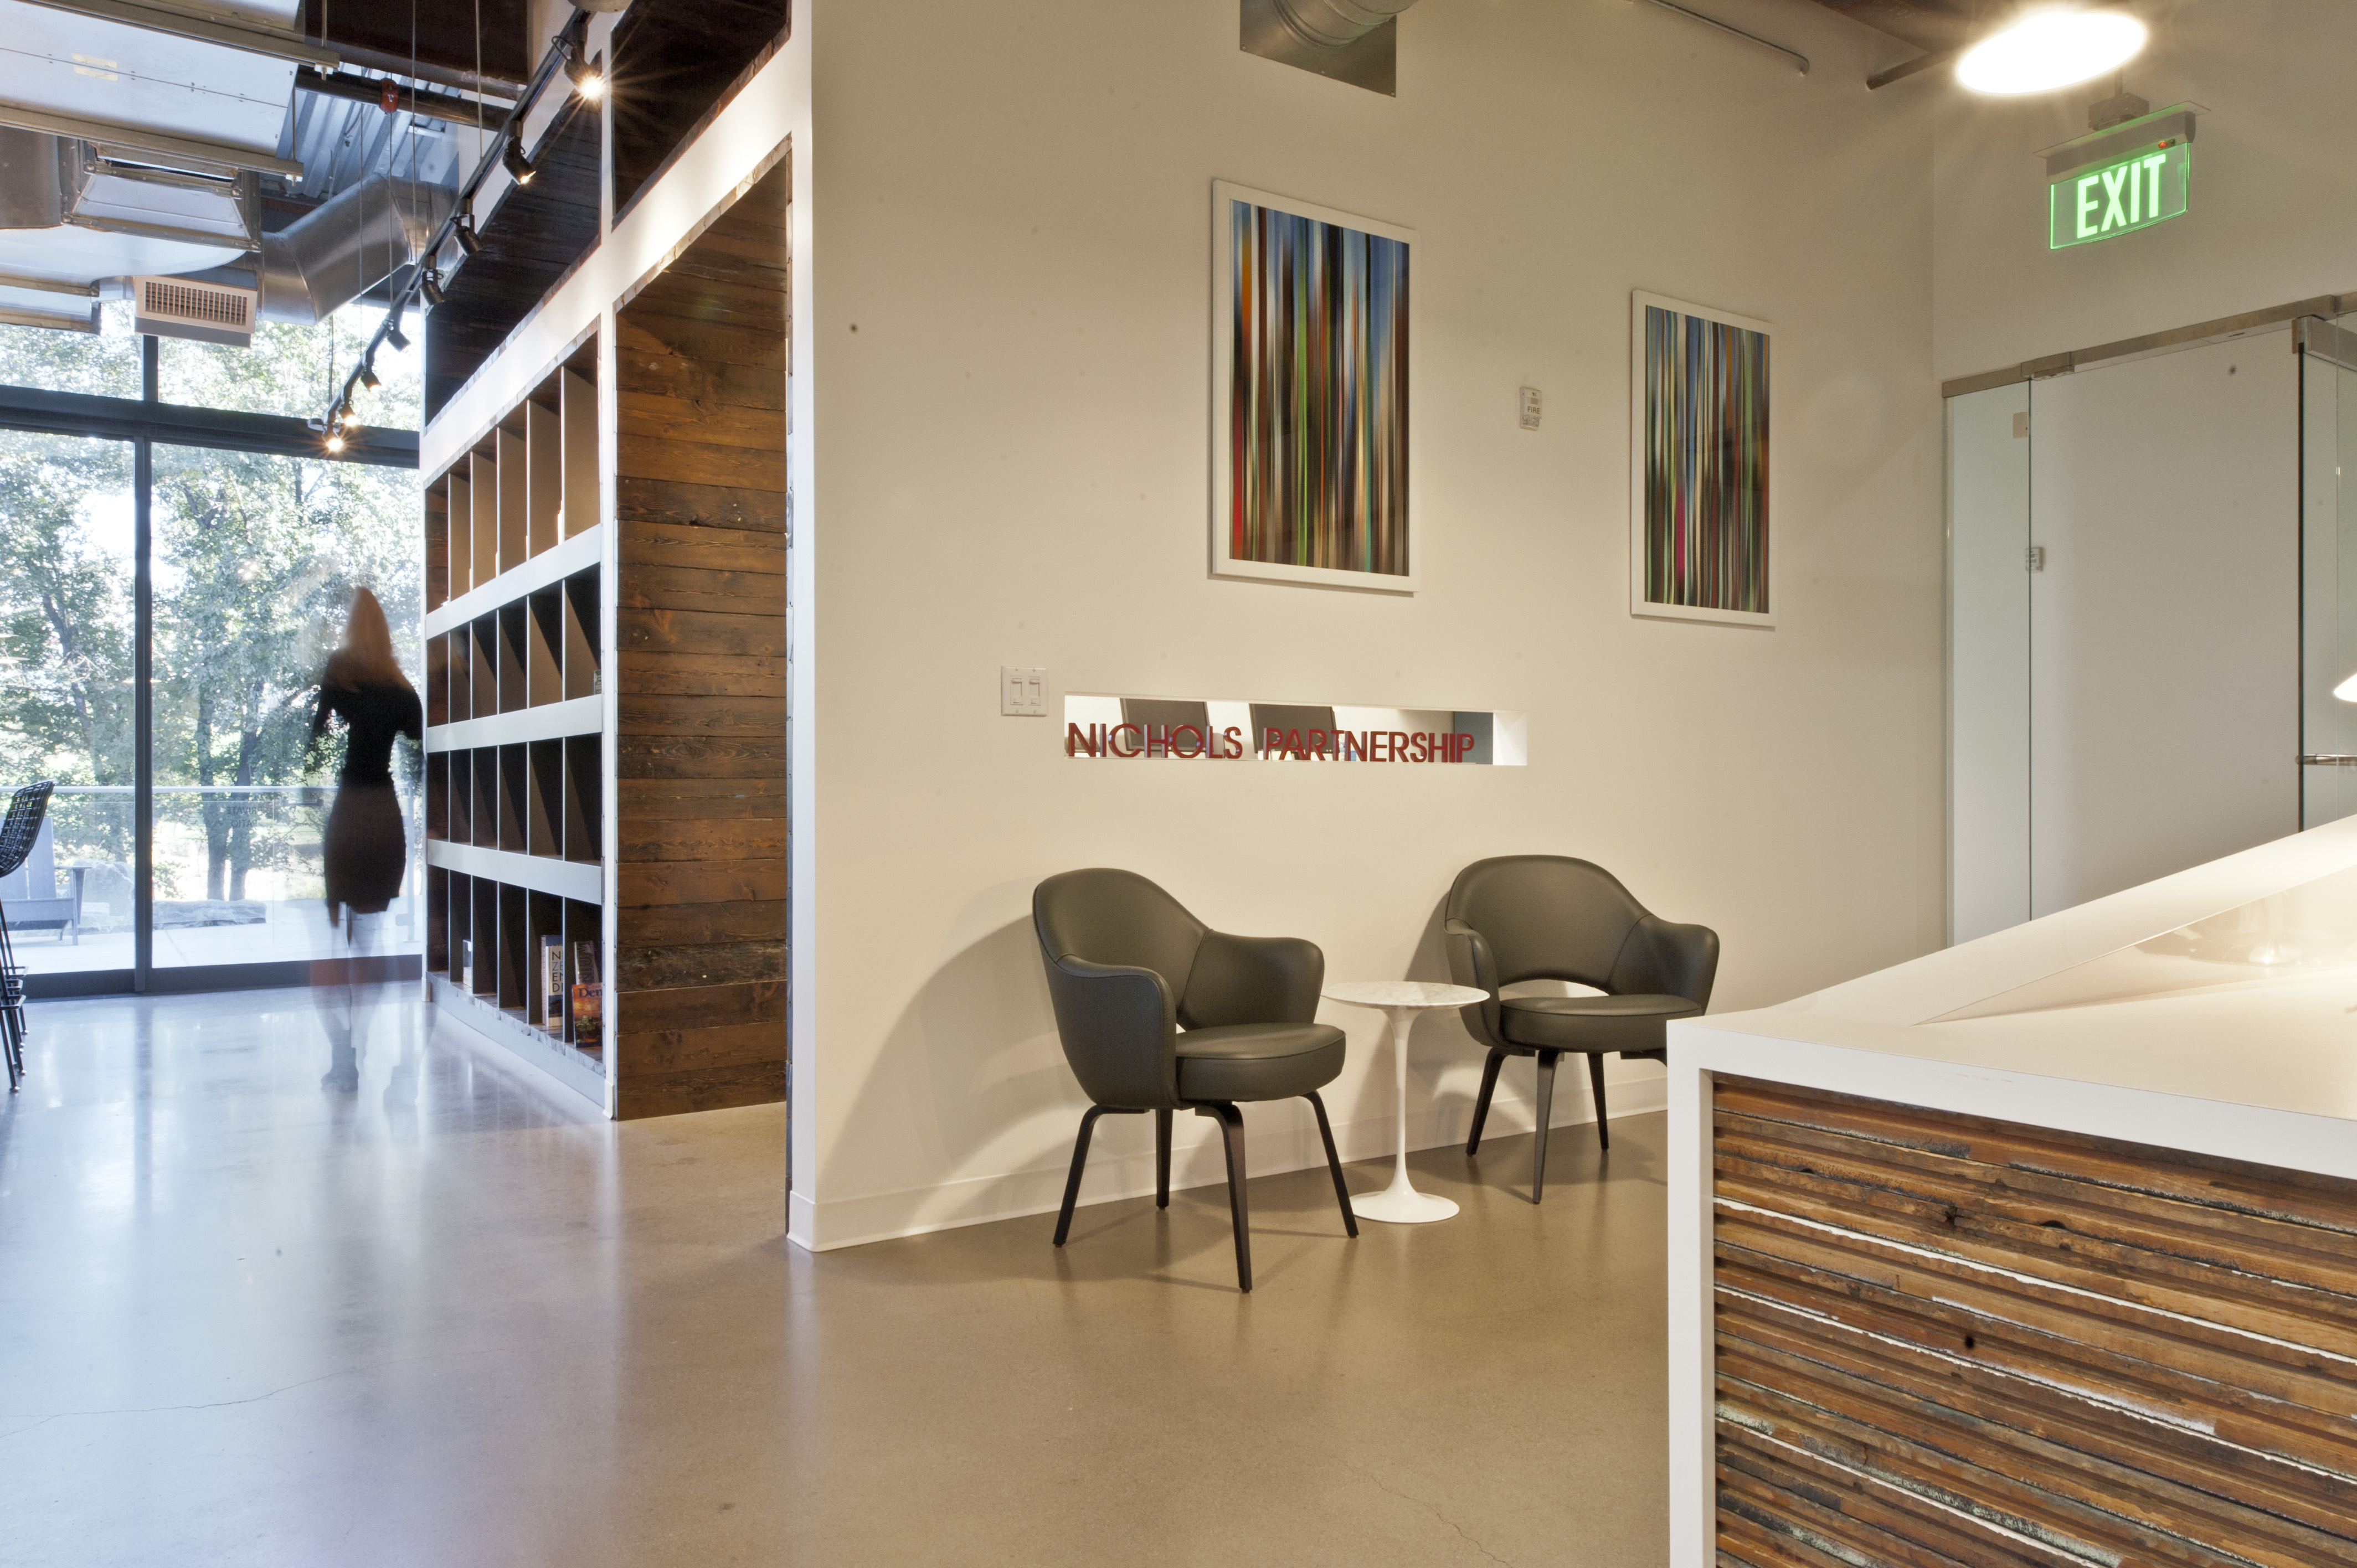 Open Studio Architecture Nichols Partnership Interior Reception OSA